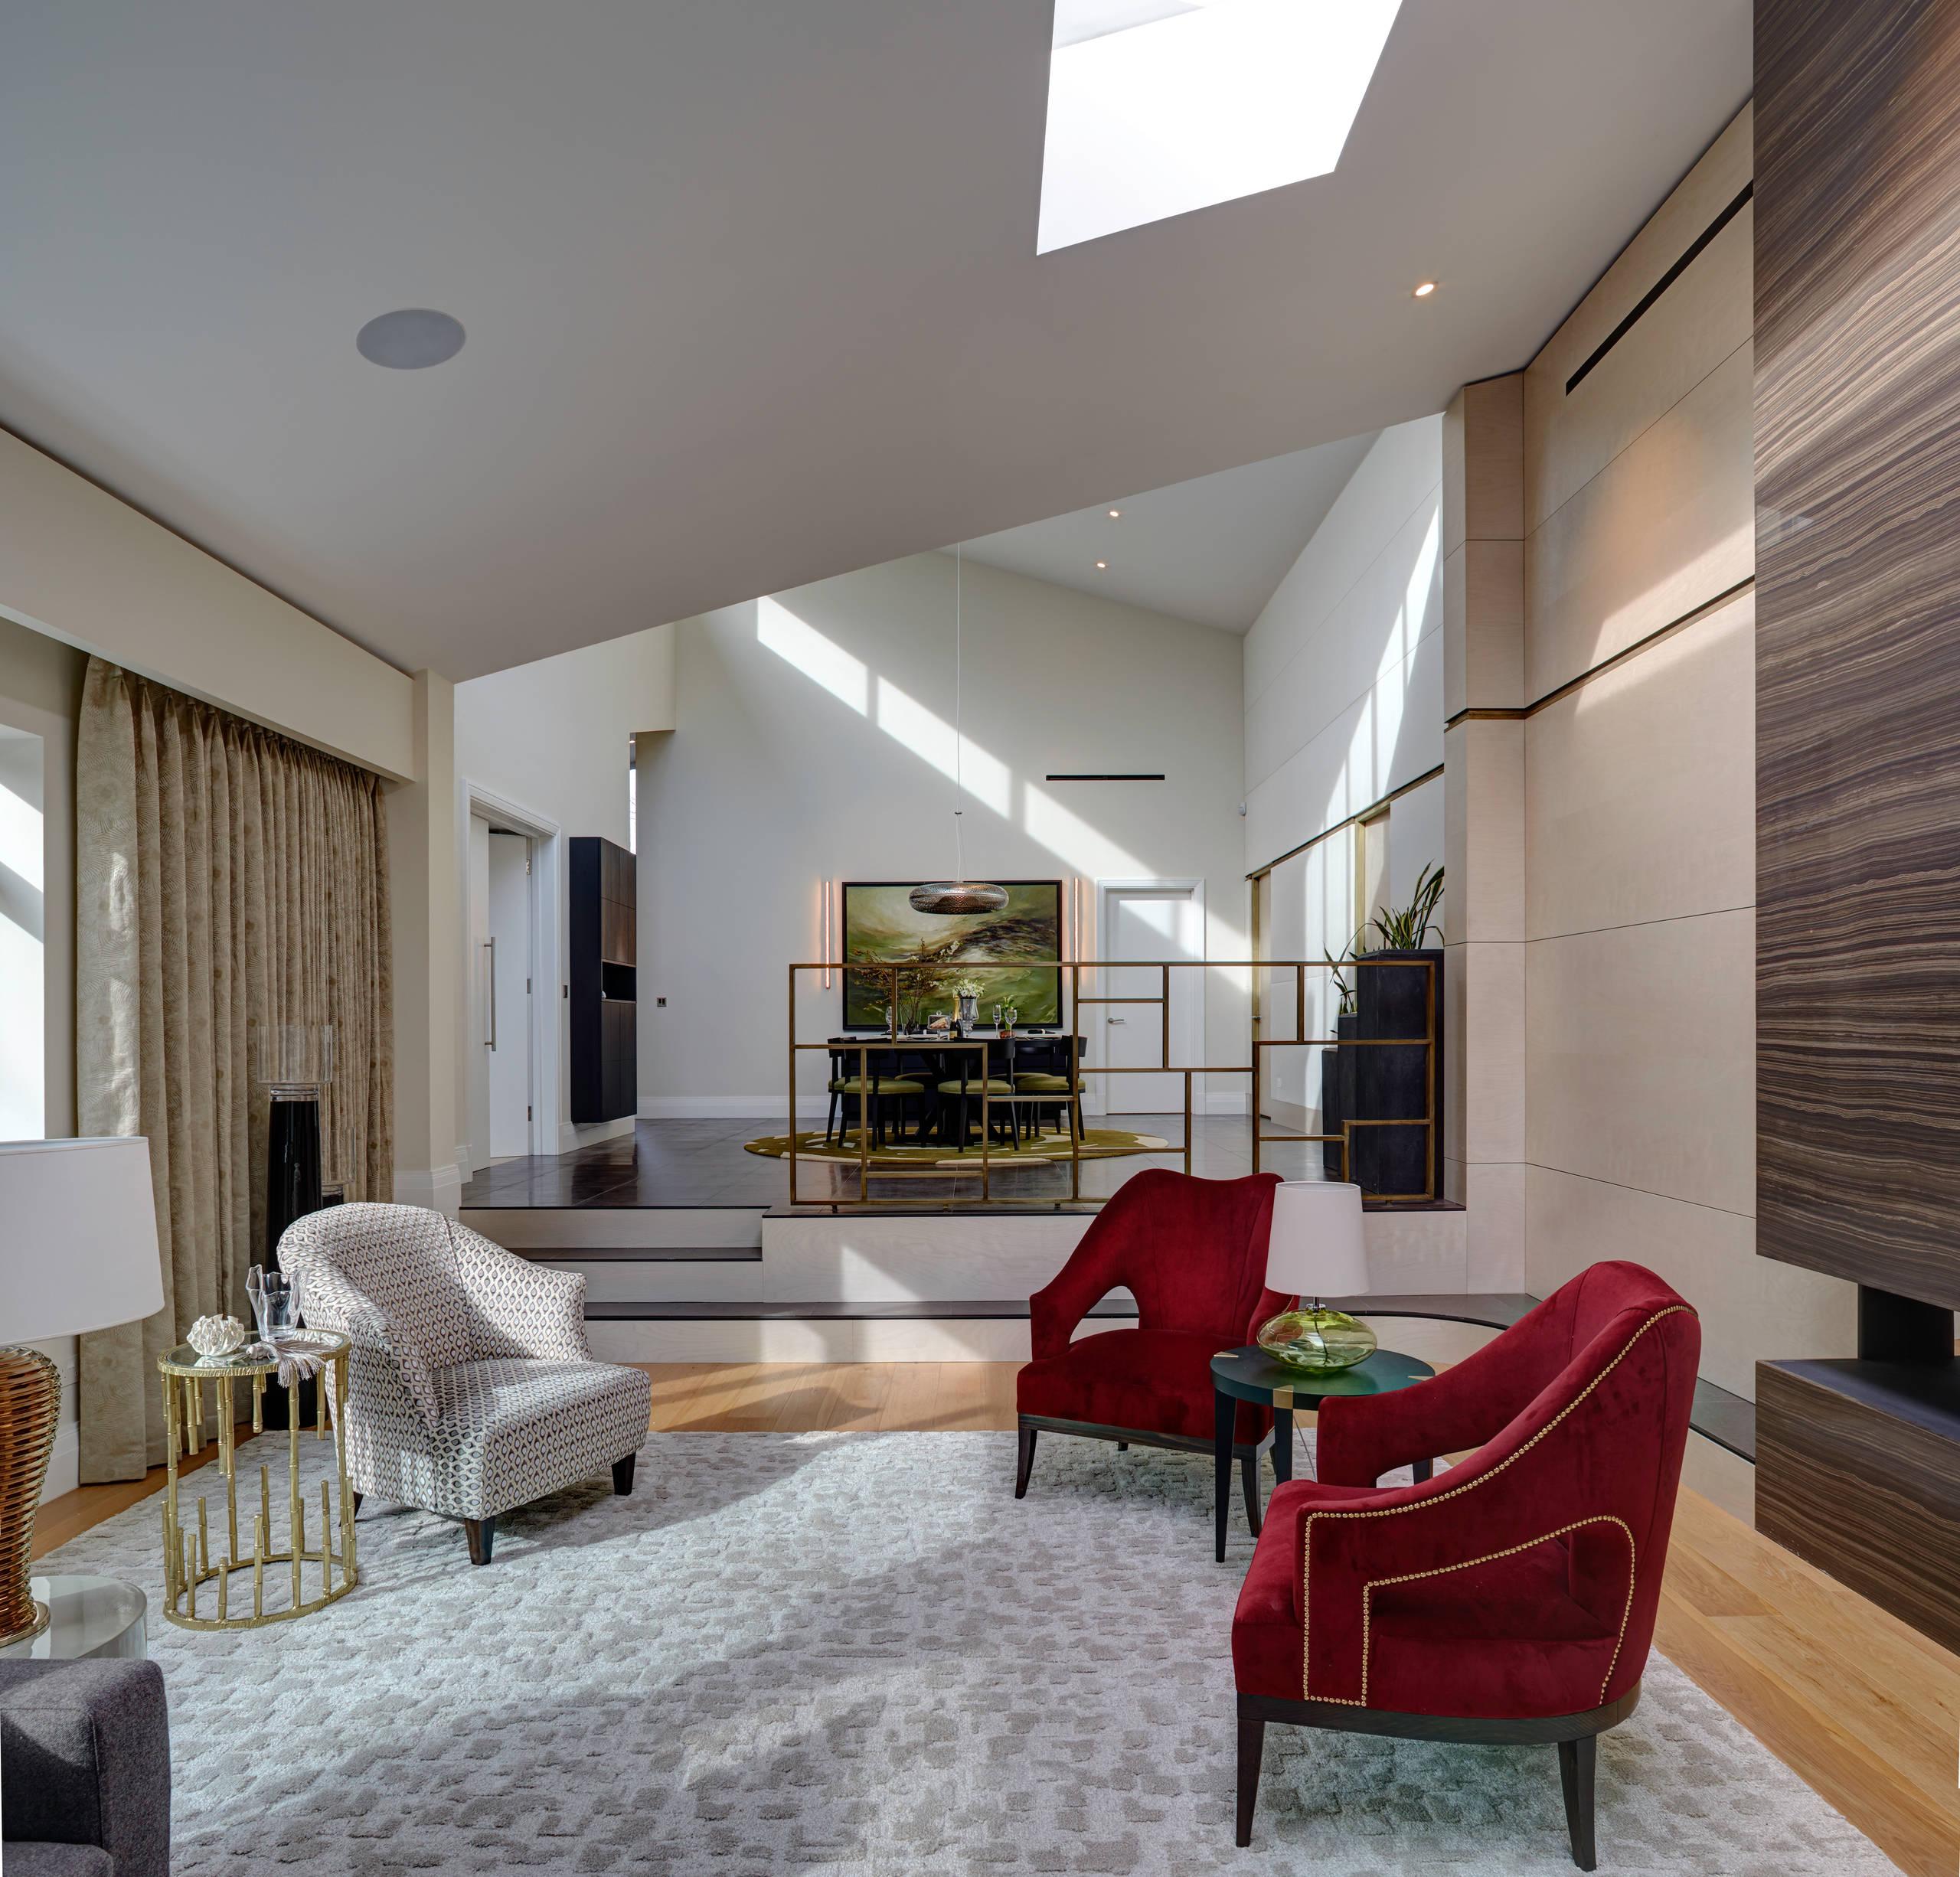 Split Level Living Room Ideas Photos Houzz